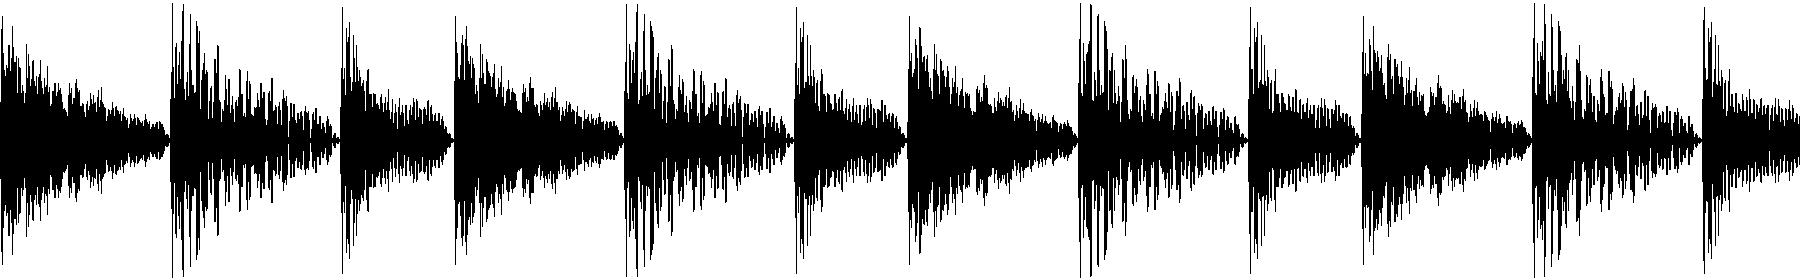 bluezone bc0210 percussion loop 006 110